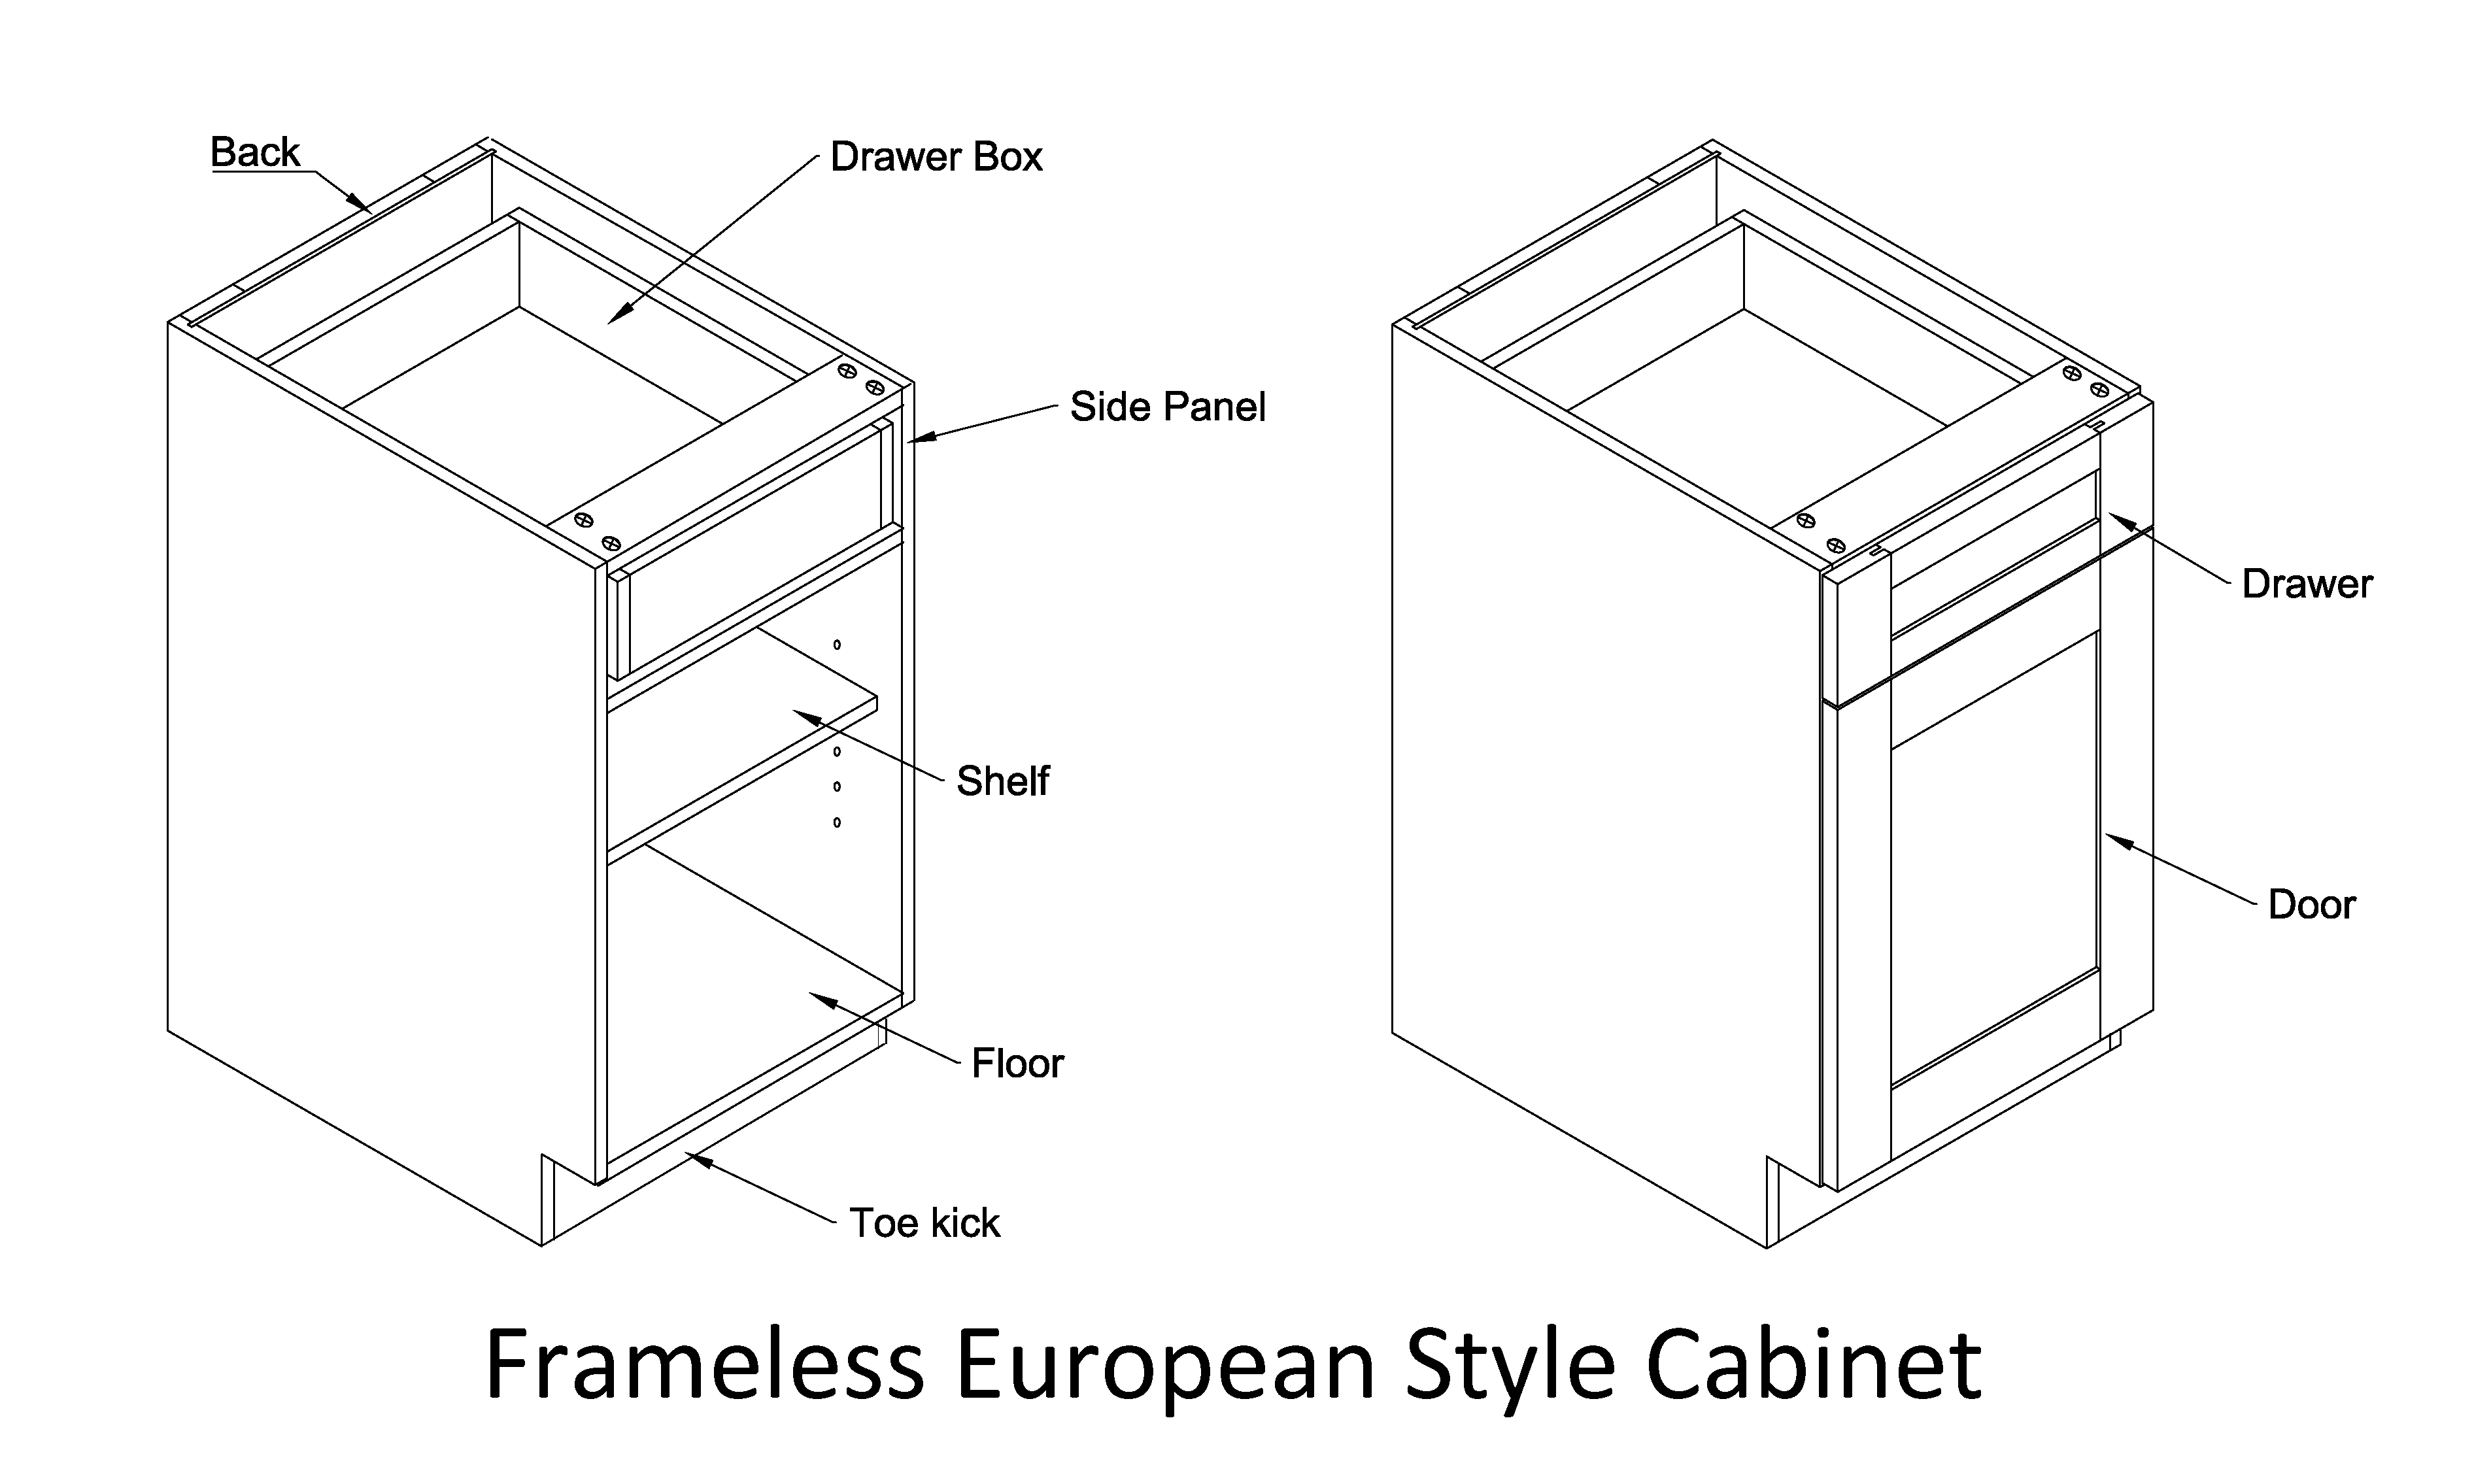 European style cabinet, frameless kitchen cabinet